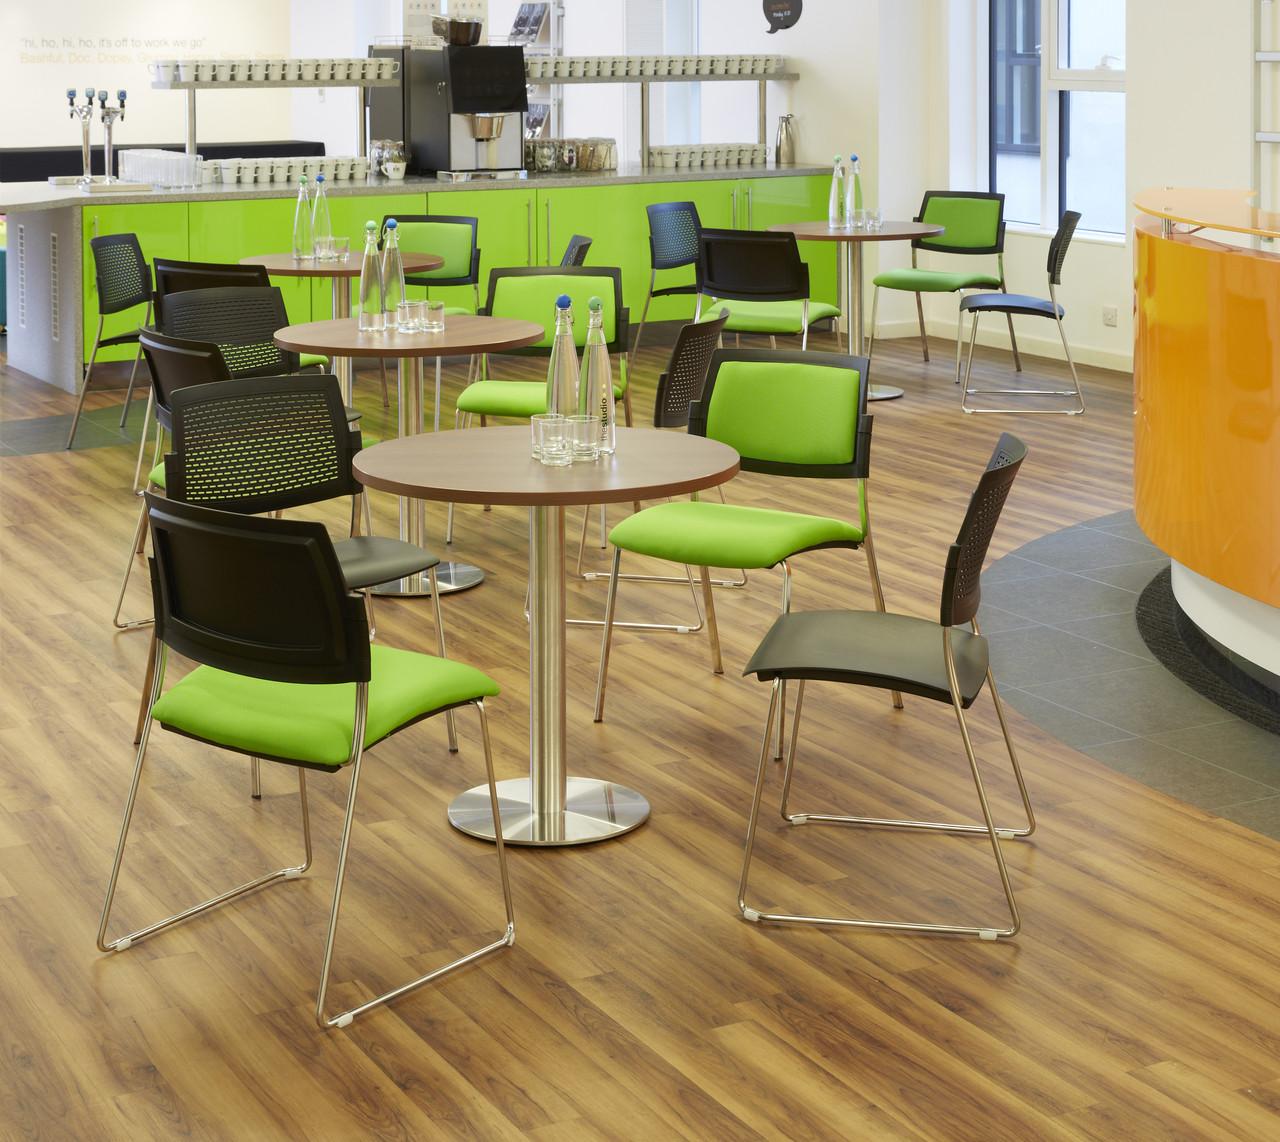 Satsu Upholstered 4-Leg - Meeting & Visitor Chairs - MSS04